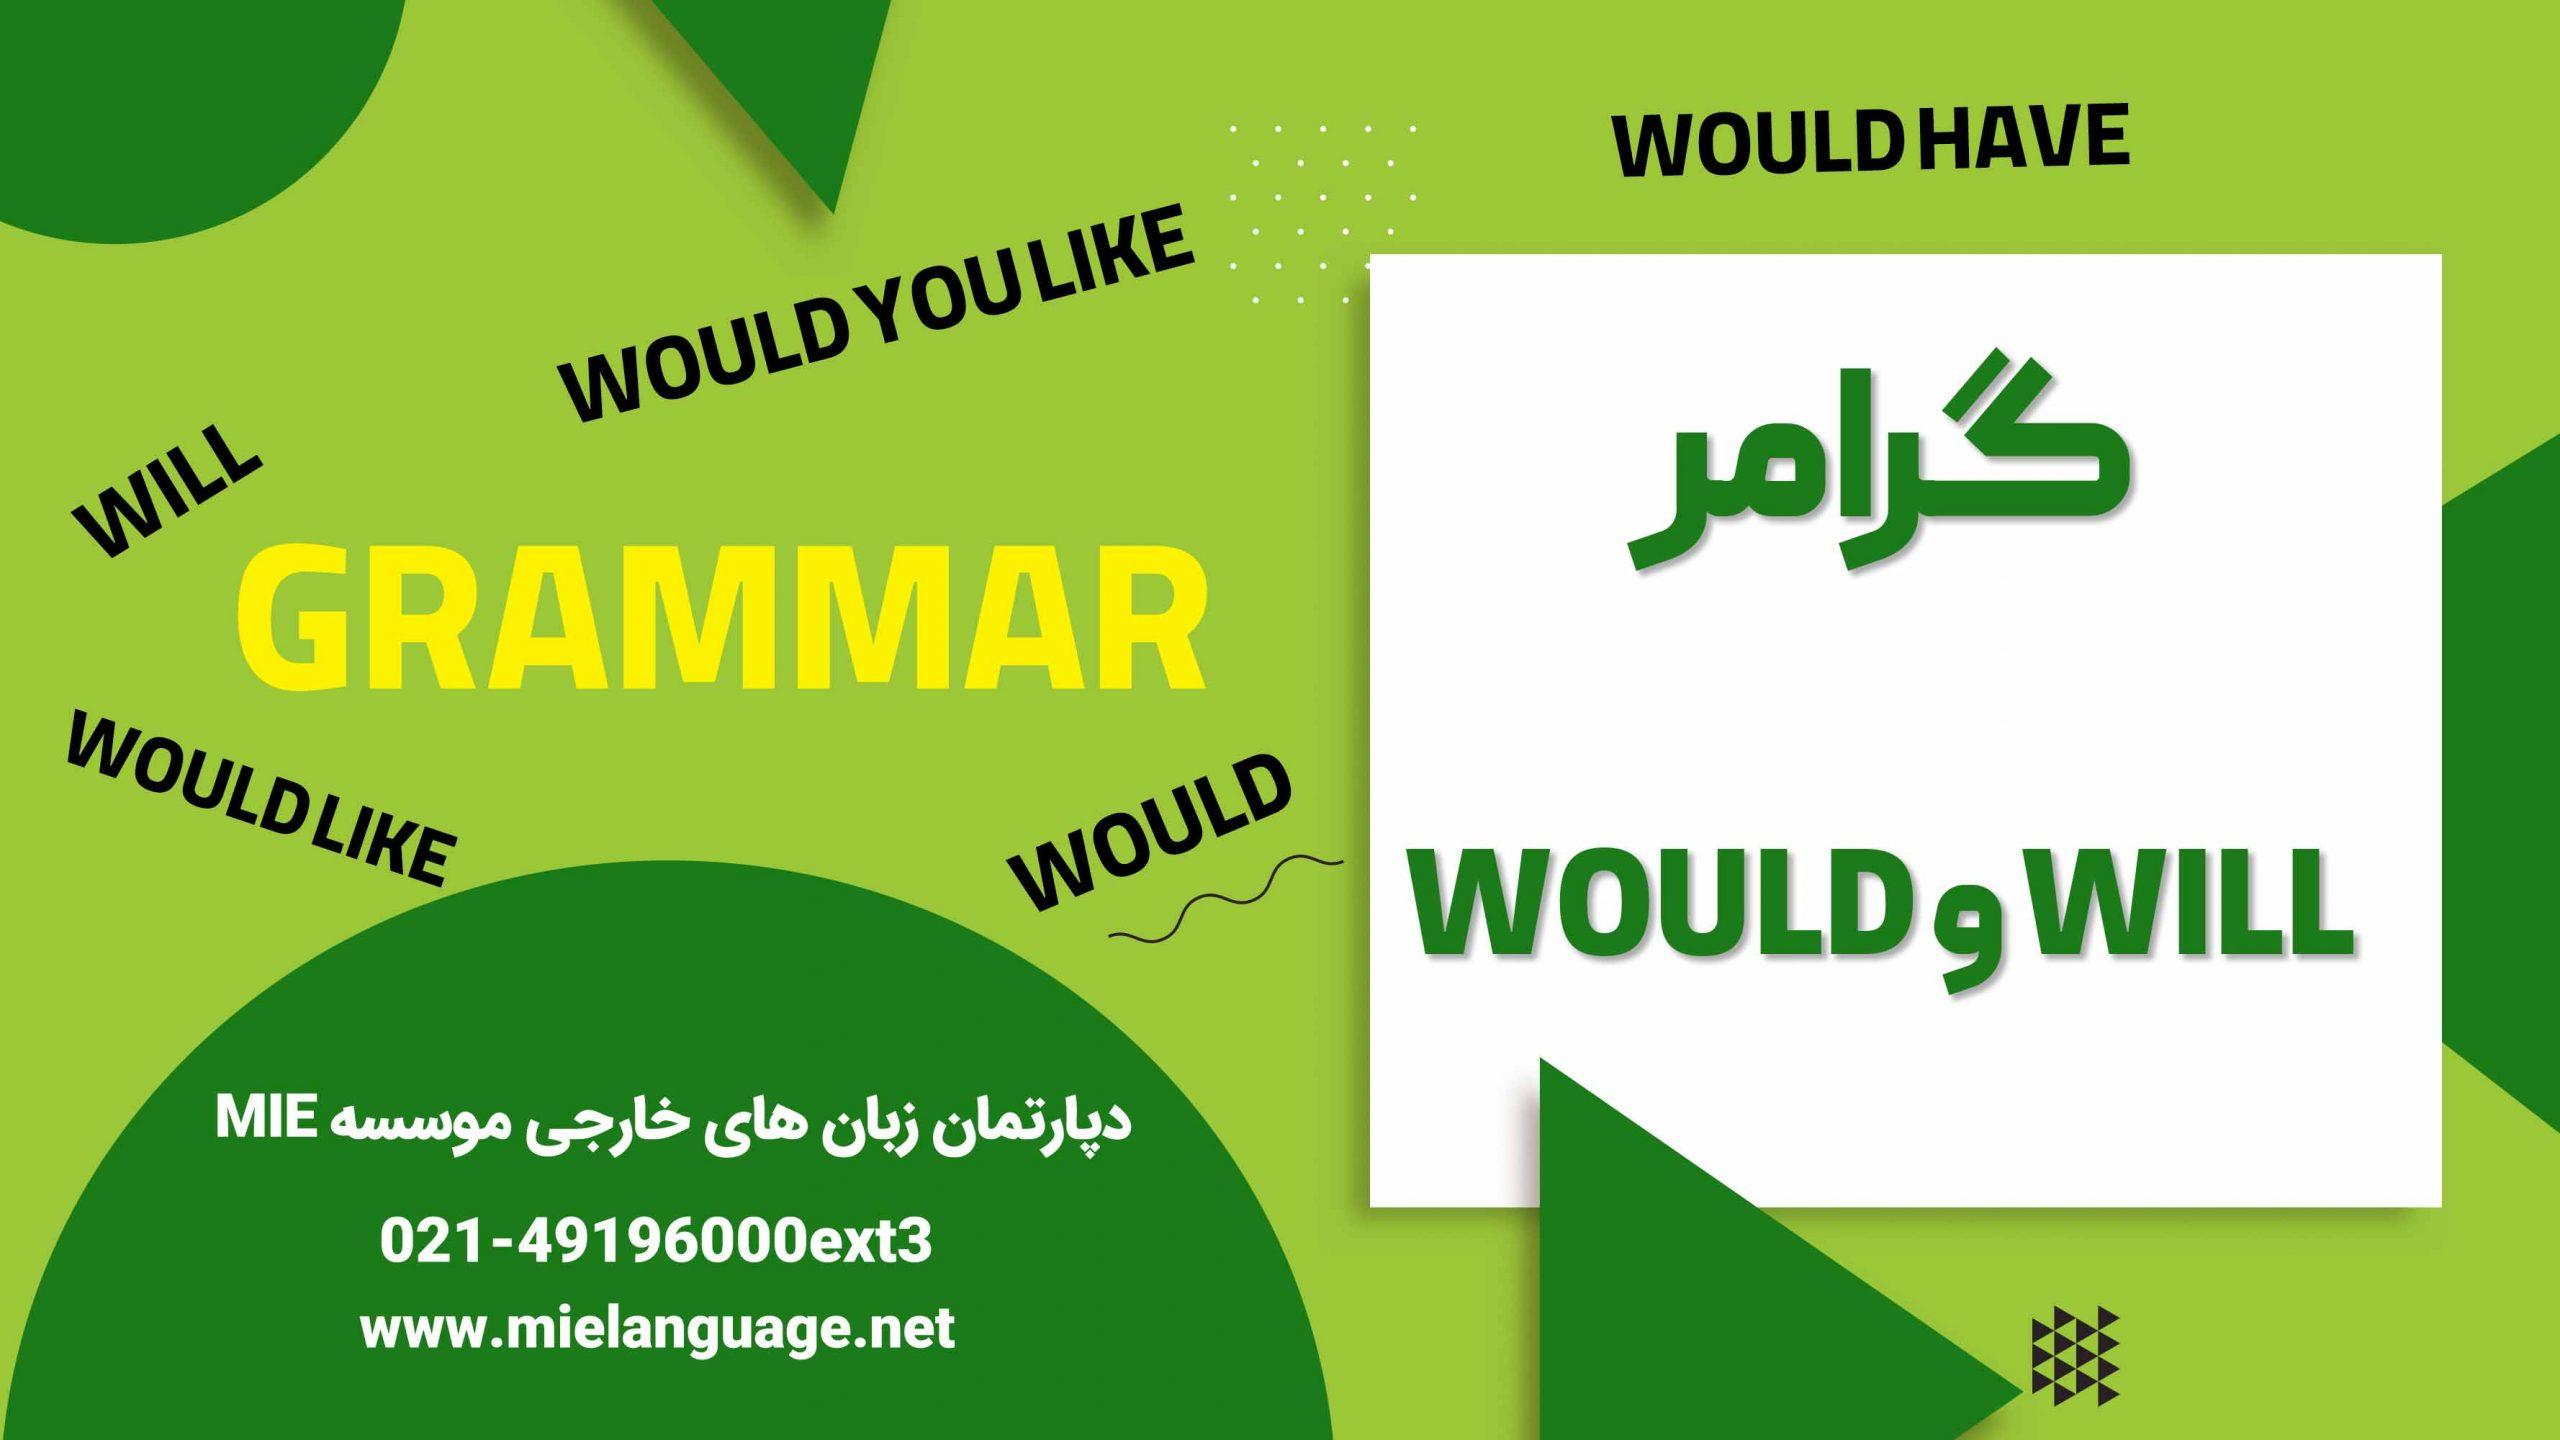 کاربرد گرامر will و would در زبان انگلیسی